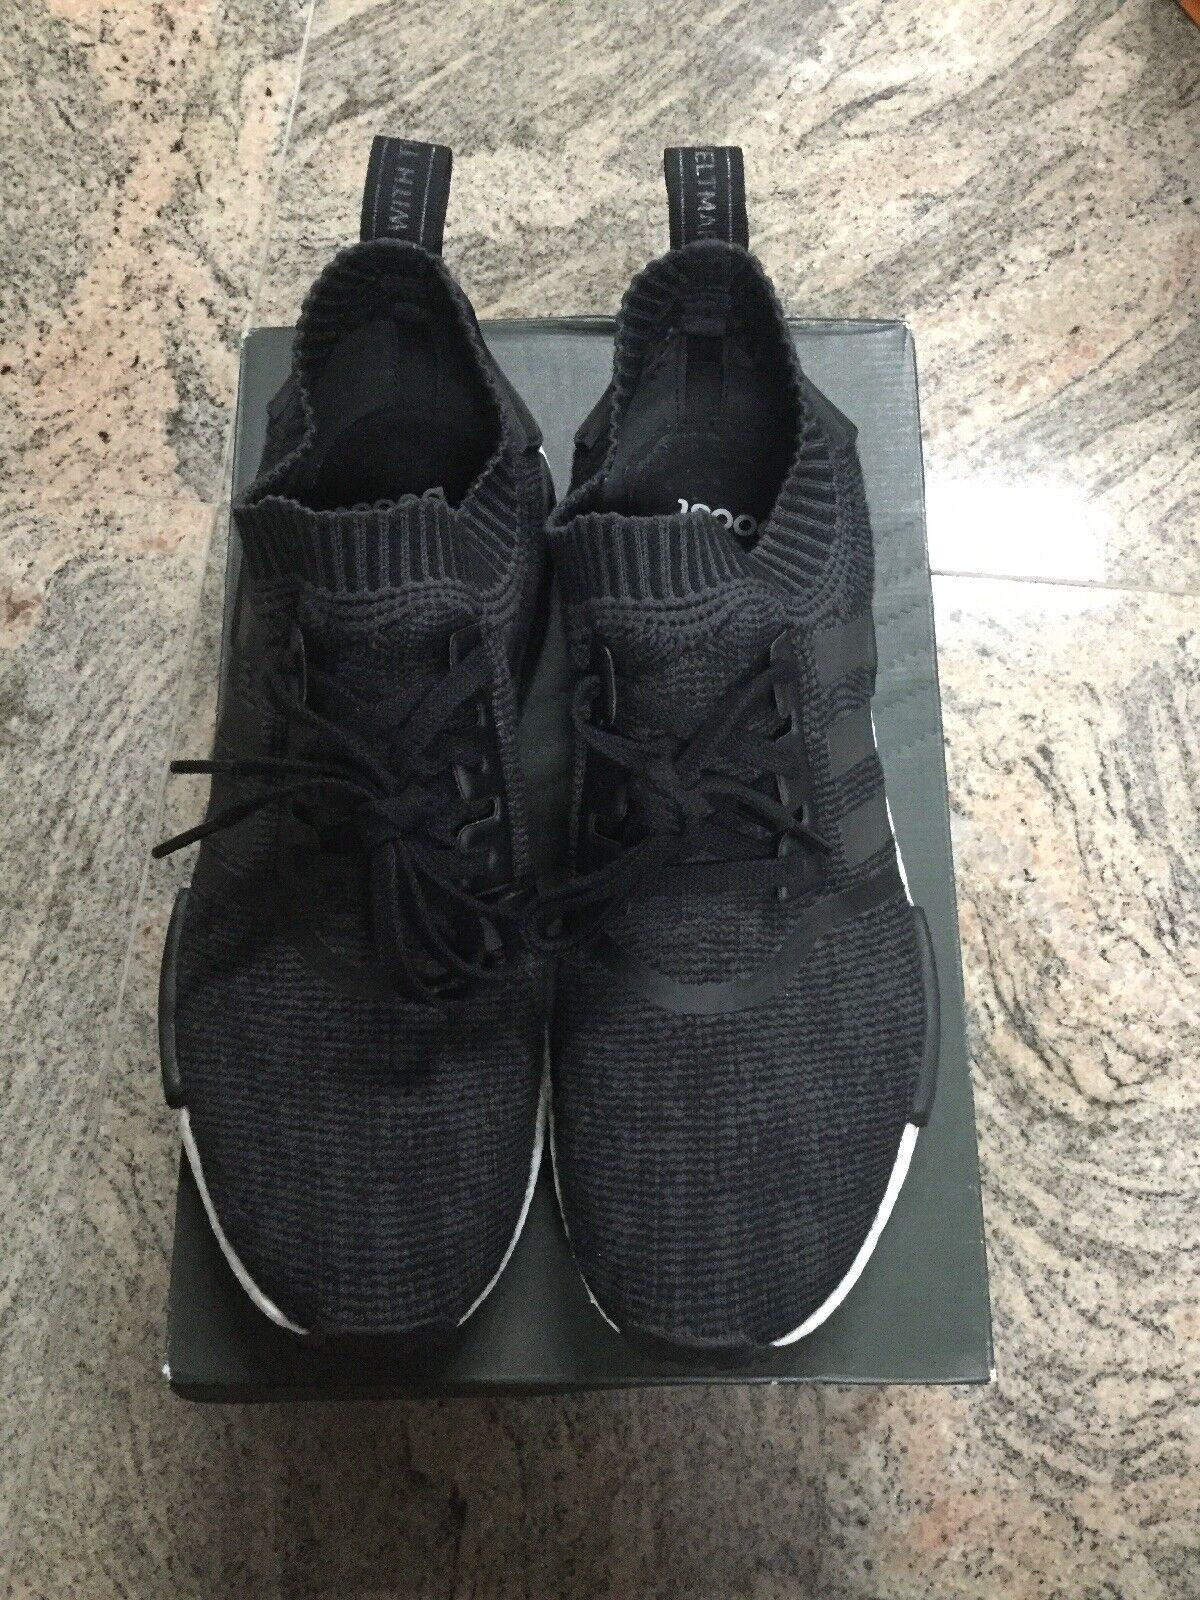 Adidas nmd r1 primeknit inverno lana primeknit r1 misura 12,5 bcffb4